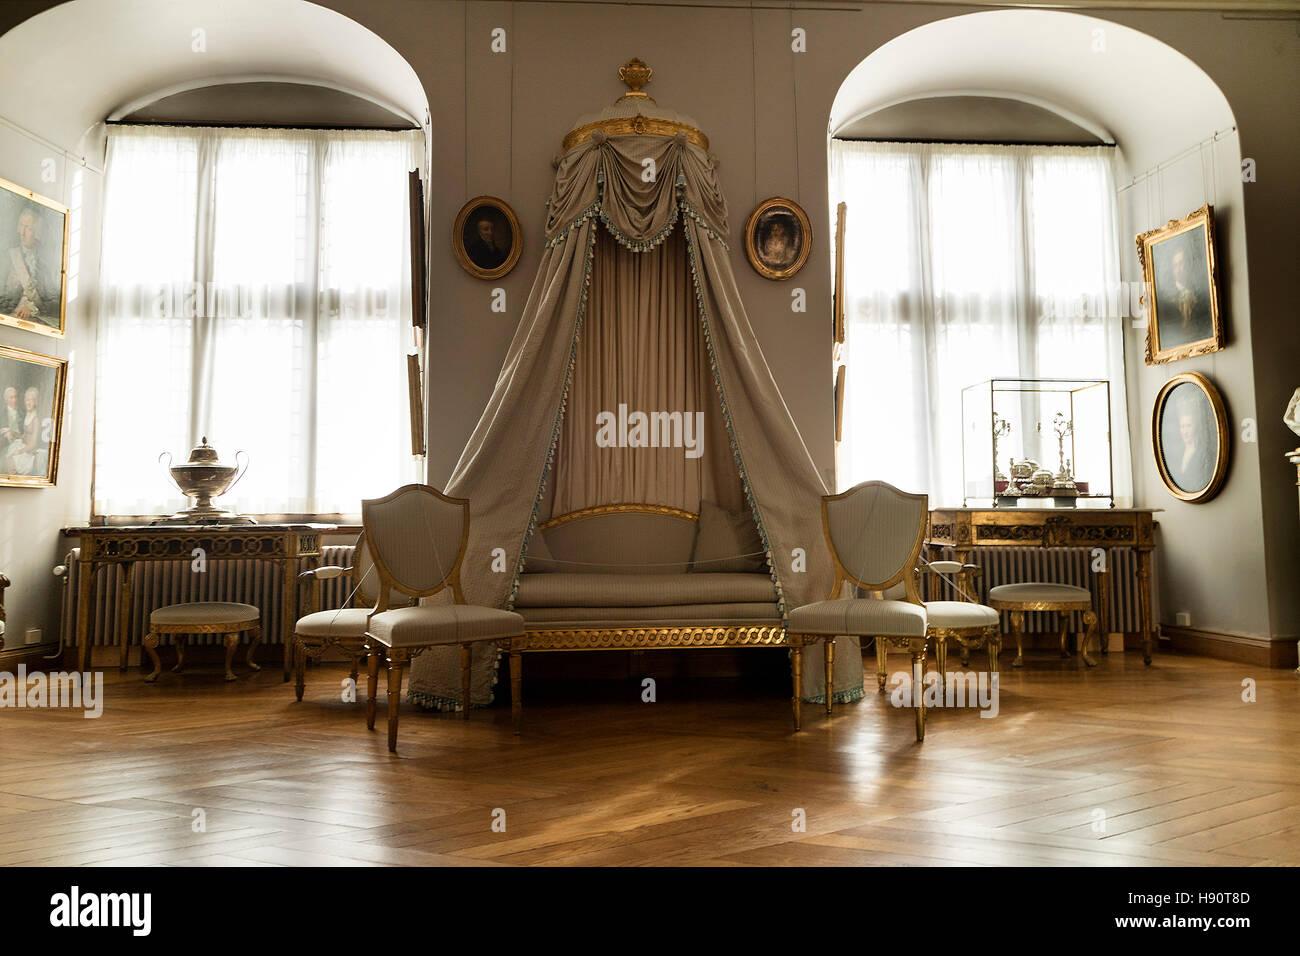 Room in Frederiksborg castle, Hillerod, Denmark - Stock Image